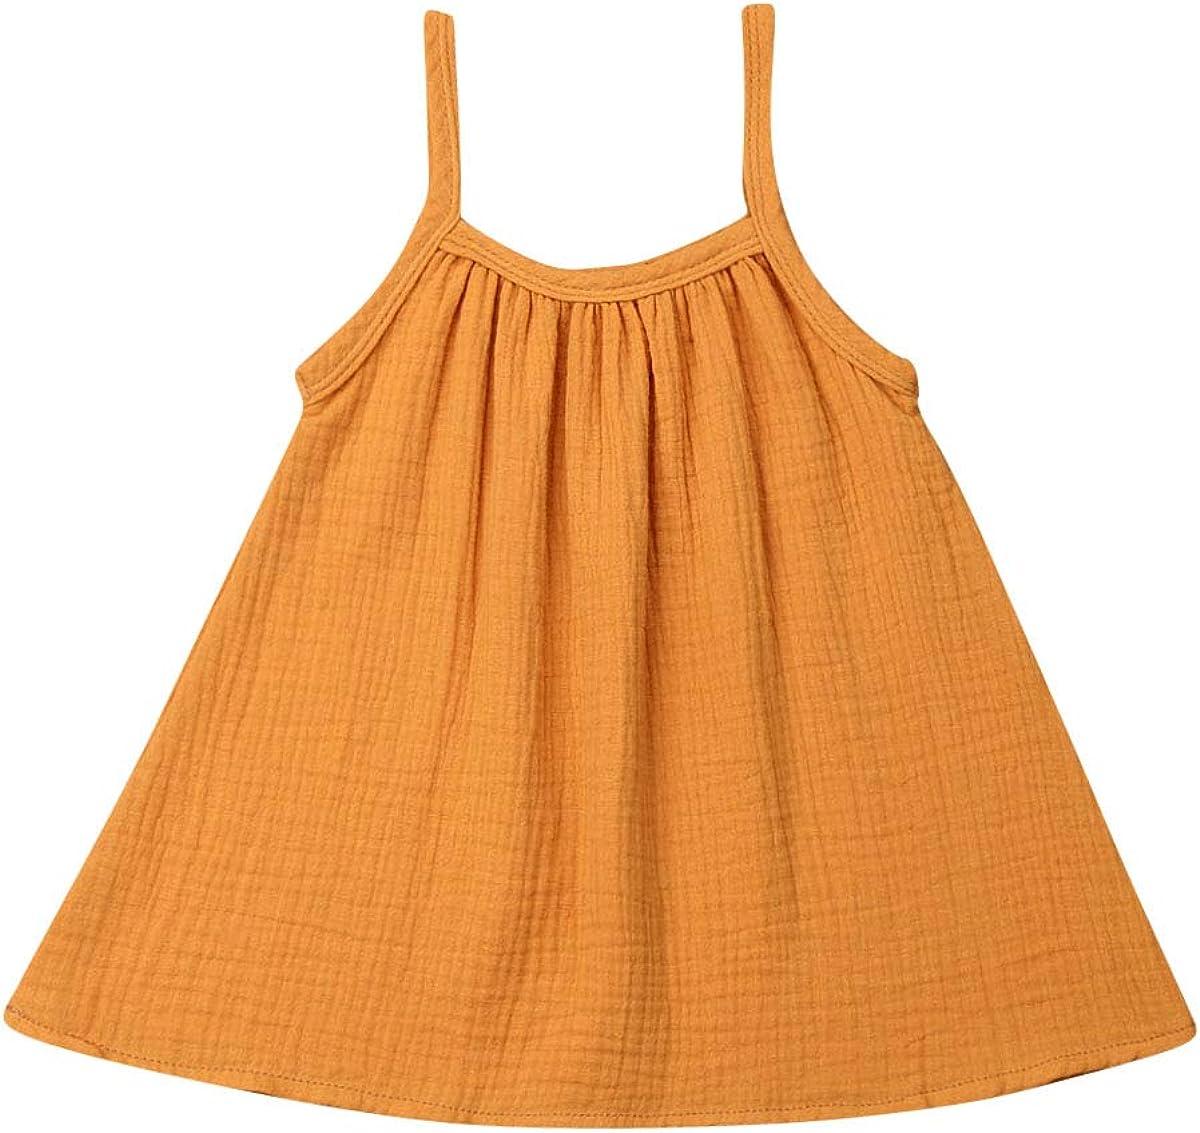 FOCUSNORM Toddler Baby Girls Dress Cotton Spaghetti Strap Sleeveless Bow Knot Princess Skirt Overall Dress